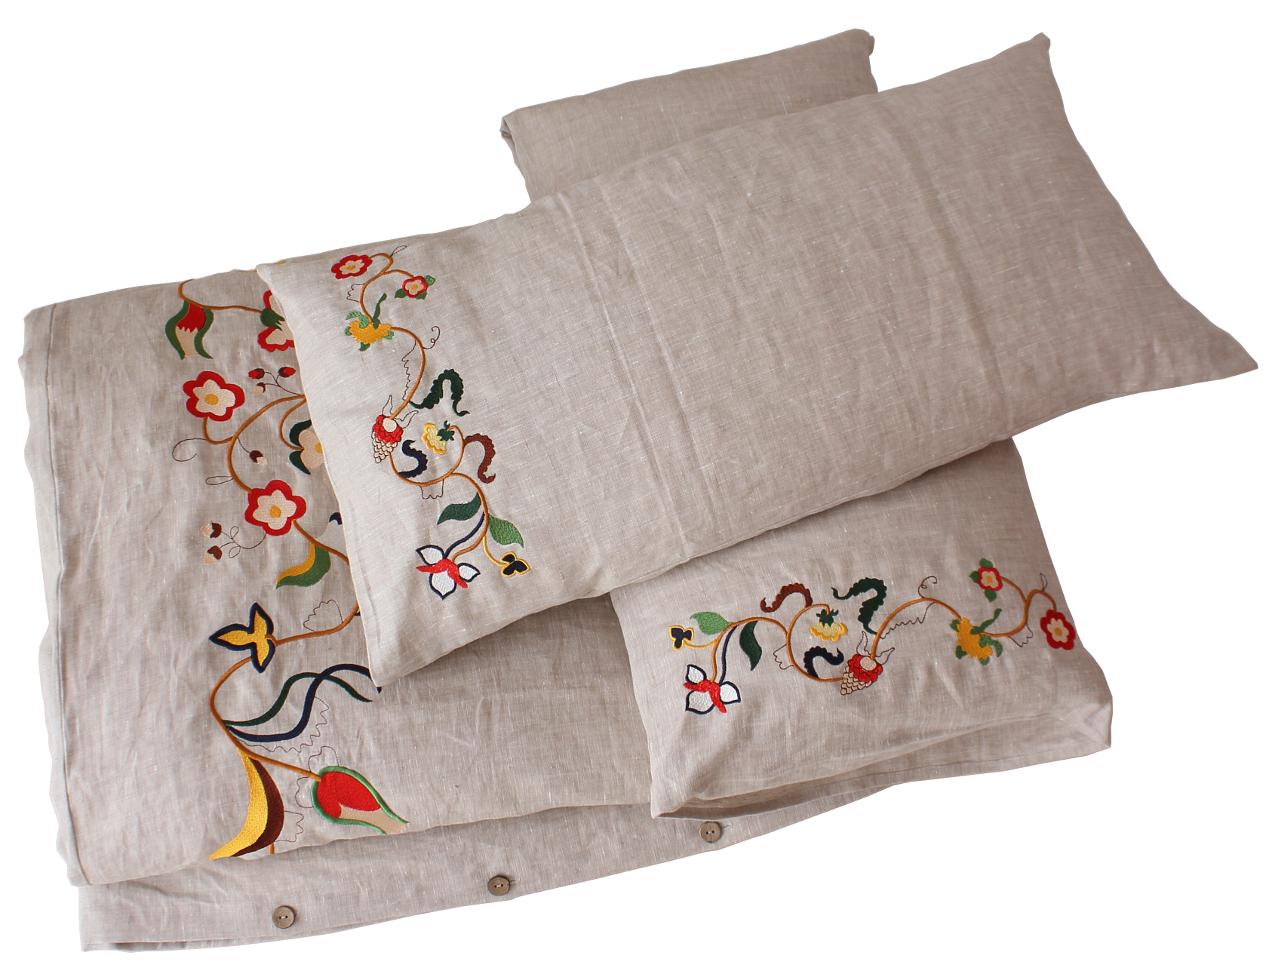 Comfybedlinen S Innovative Embroidered Linen Bedding For